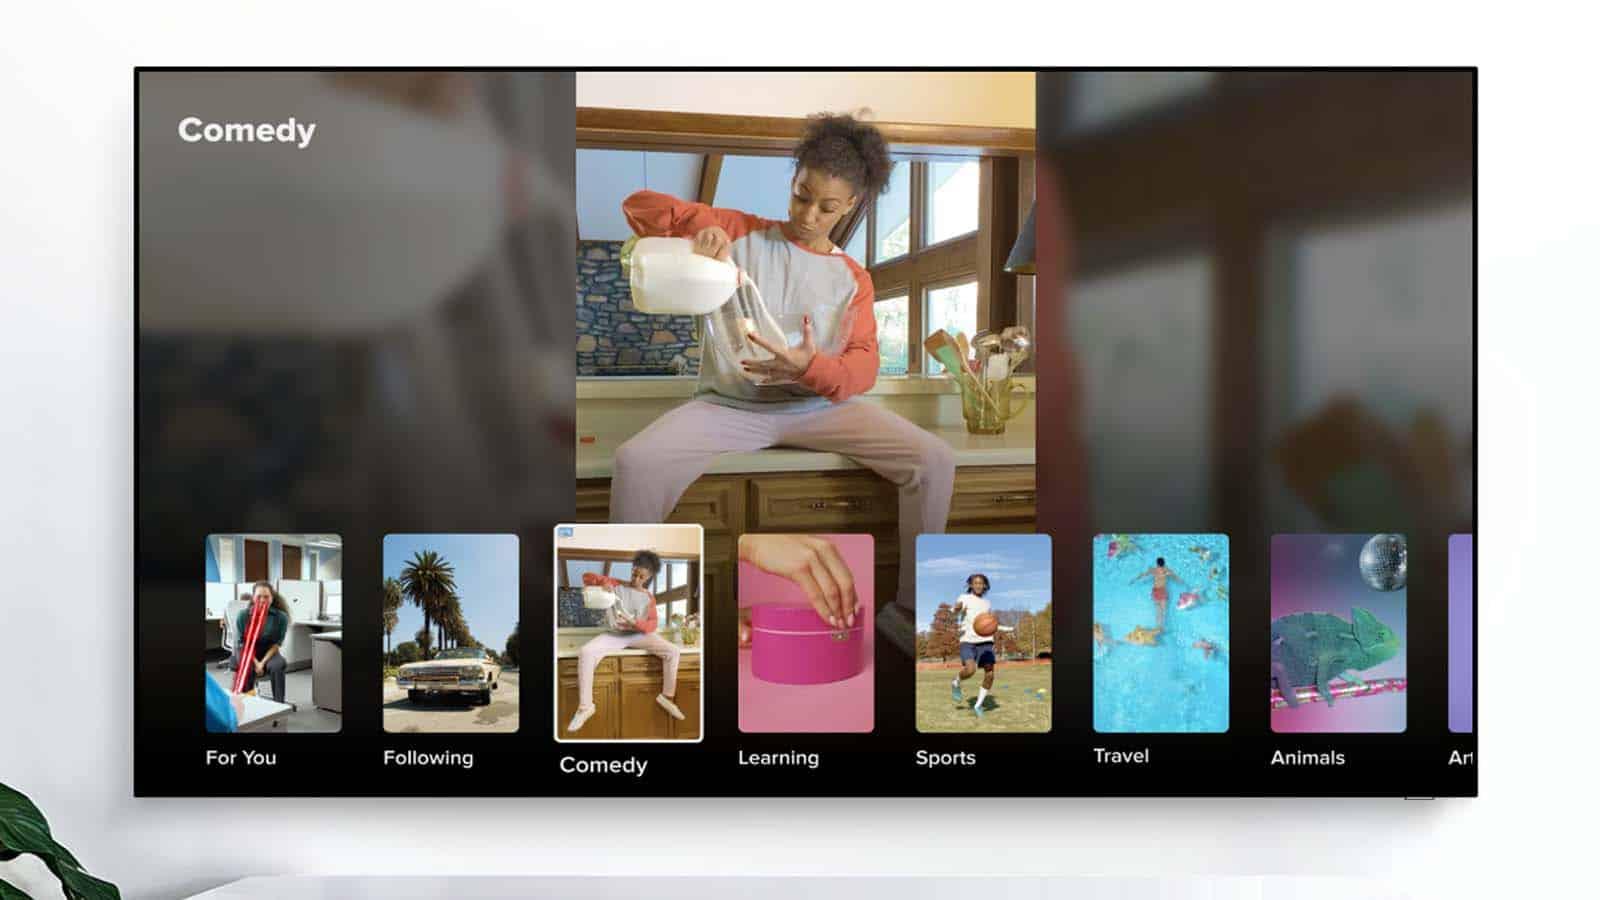 tiktok on a samsung smart tv